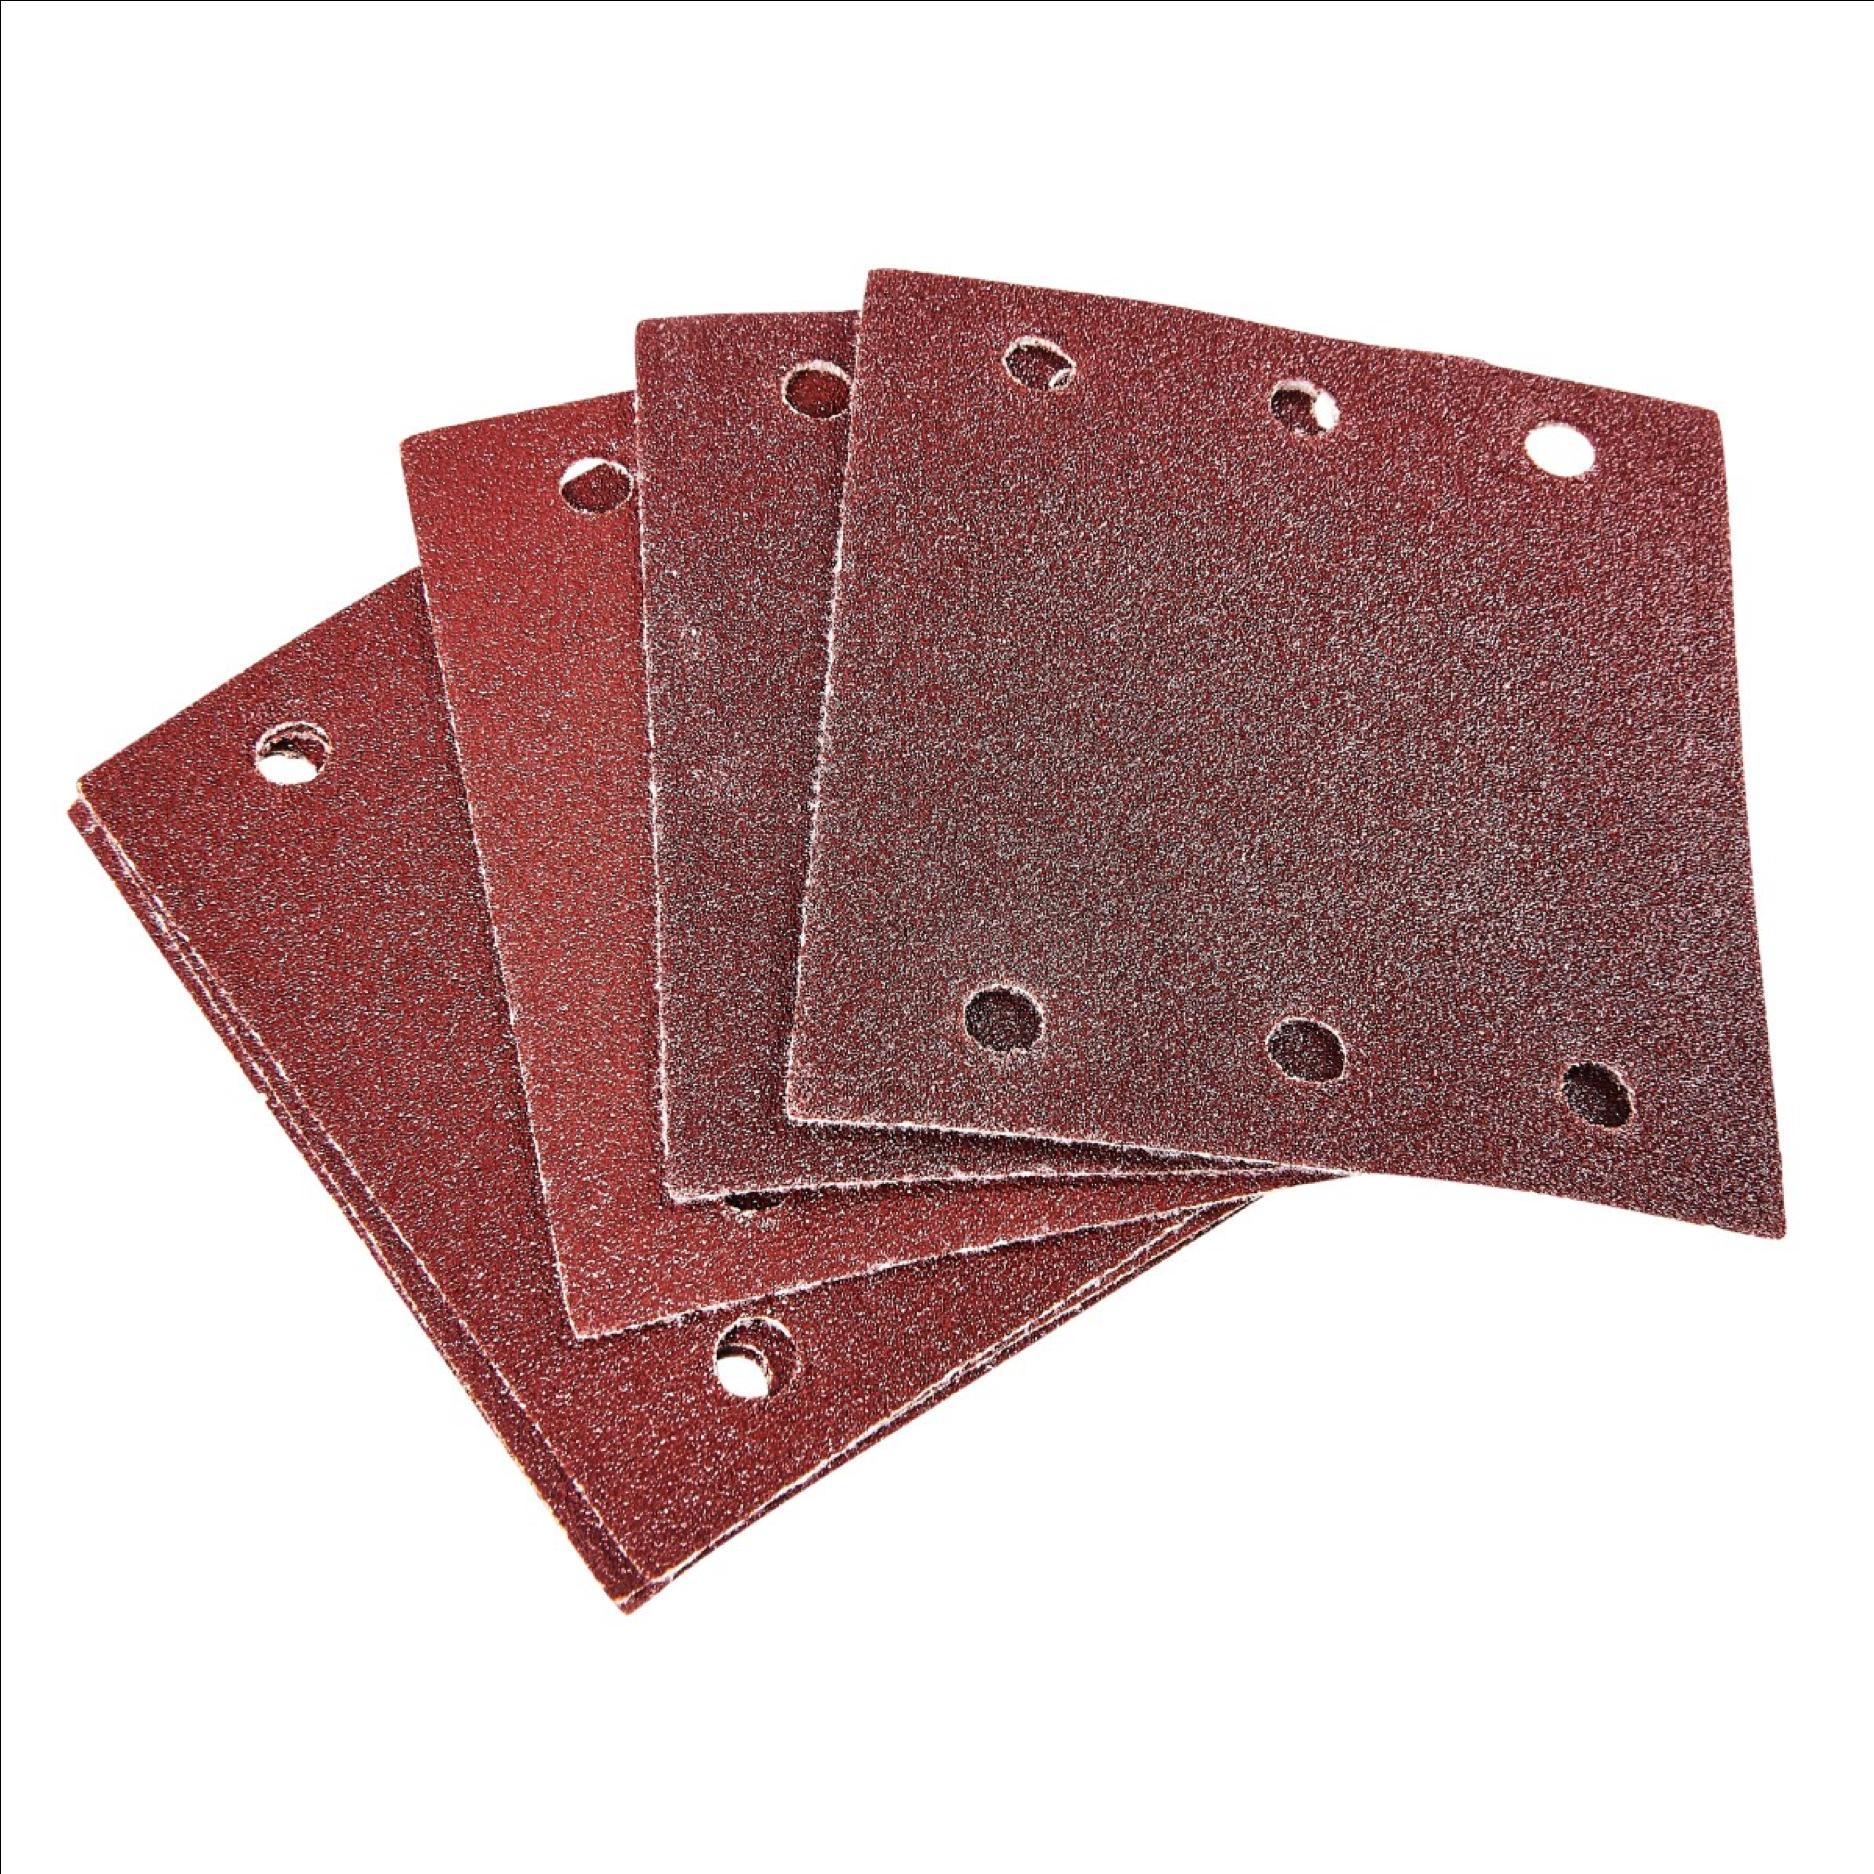 Bodbii 10pcs Aluminum Alloy Screwdriver Set Mini Precision Small Leather Case Tools Phone PC Laptop Repair Kits